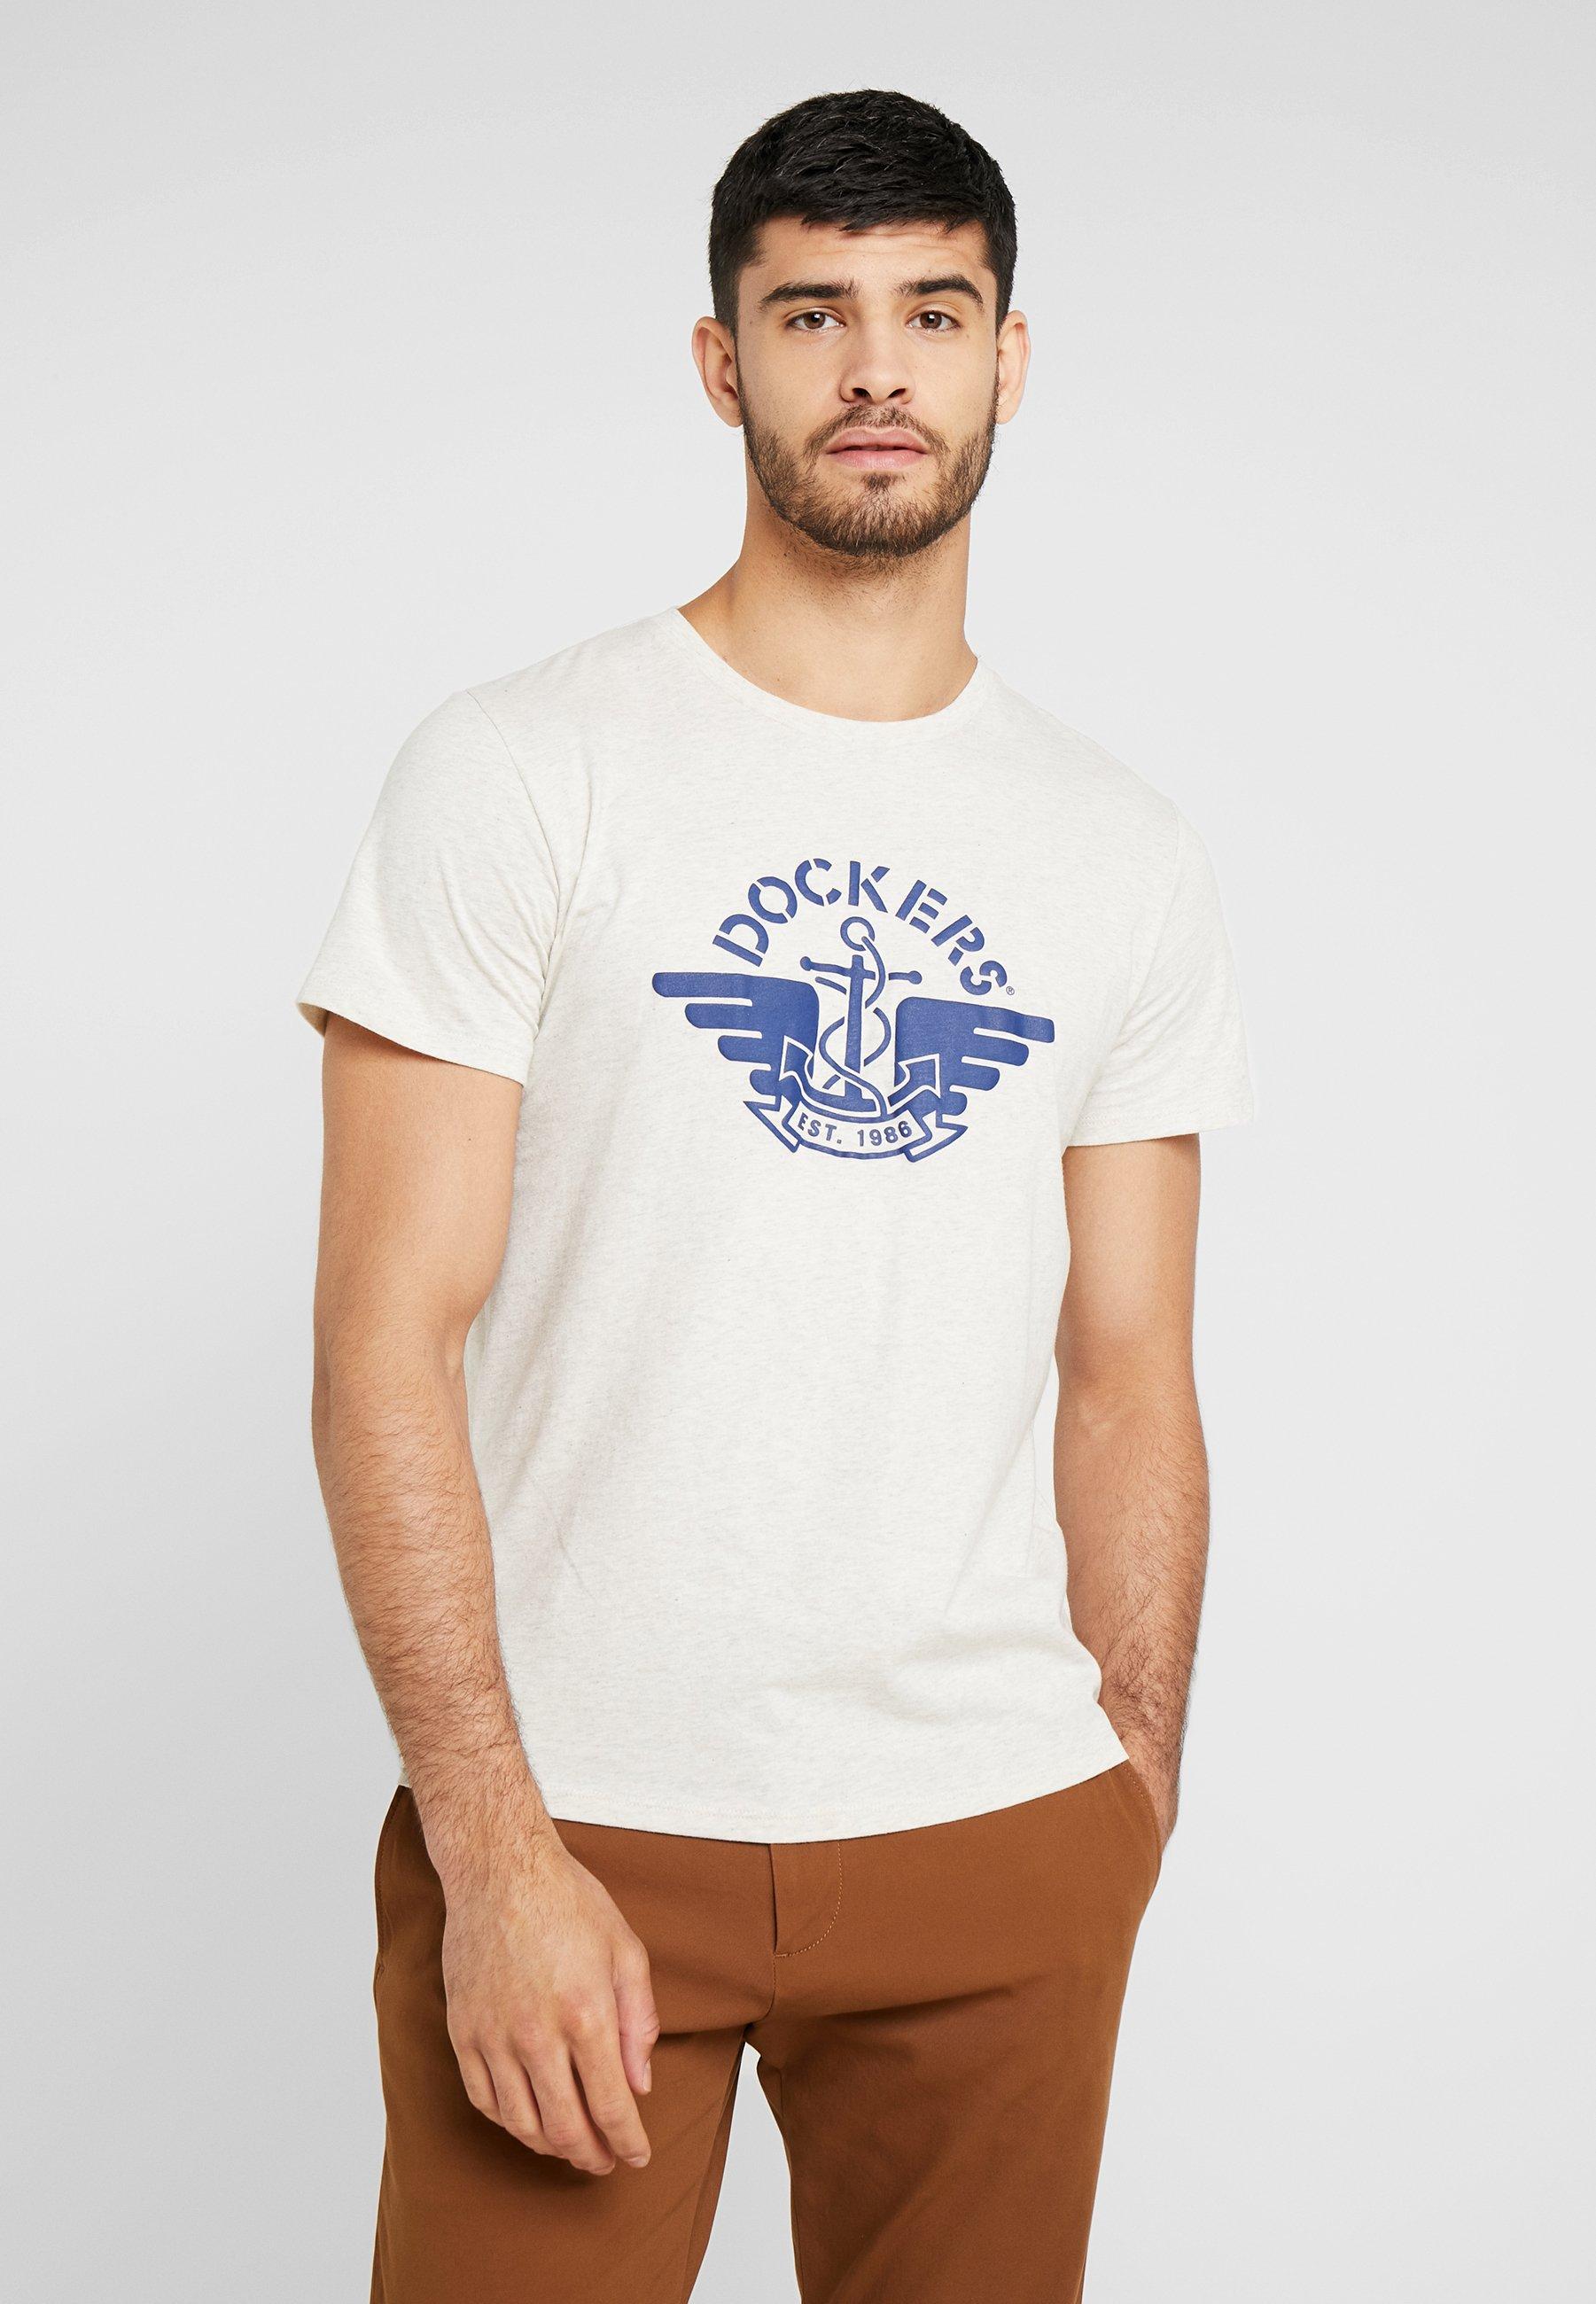 DOCKERS GRAPHIC - Camiseta estampada oatmeal heather